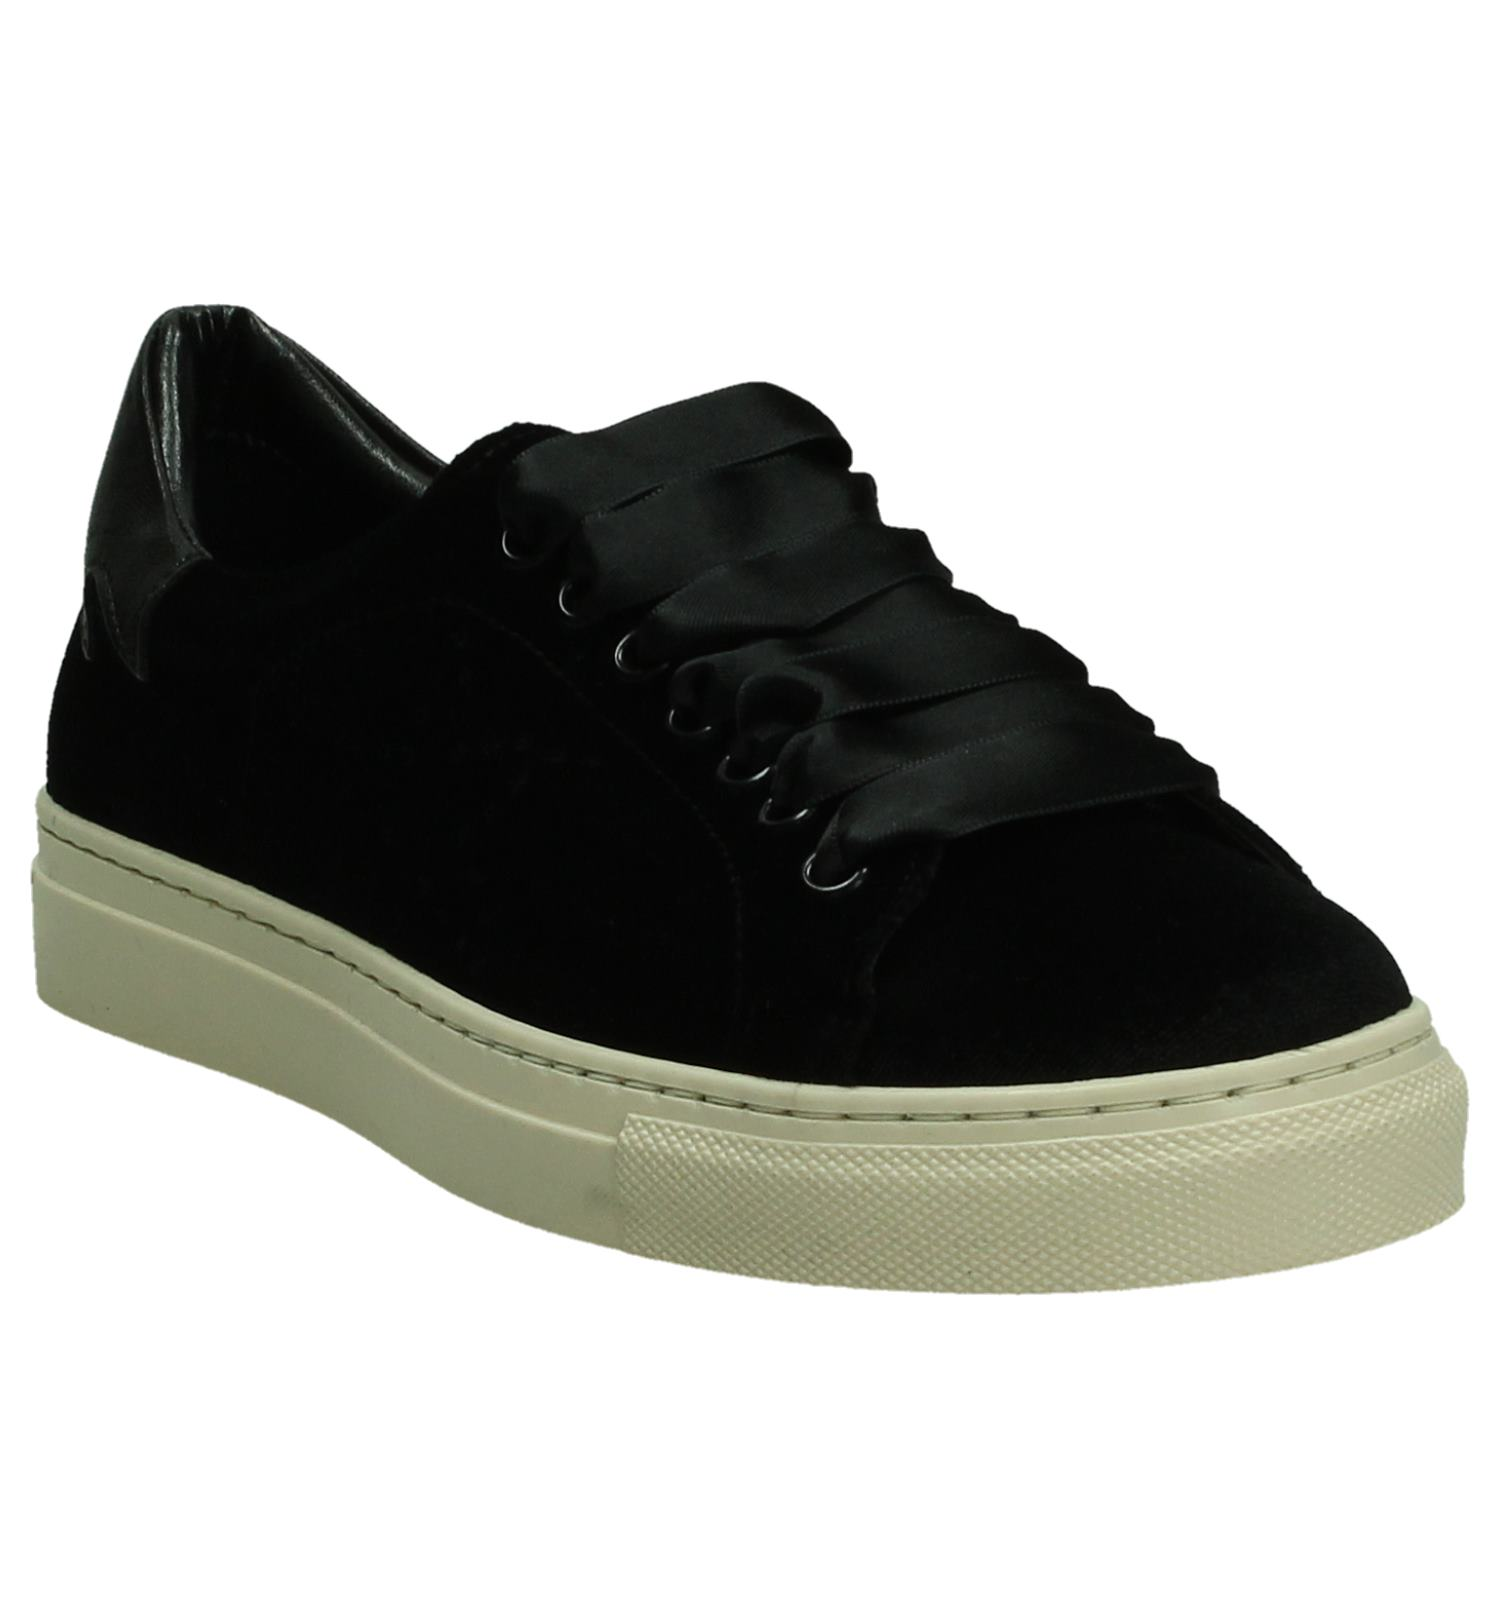 Sneaker Fluwelen Gio Zwarte Fluwelen Gio Zwarte Sneaker f6gyv7mYIb